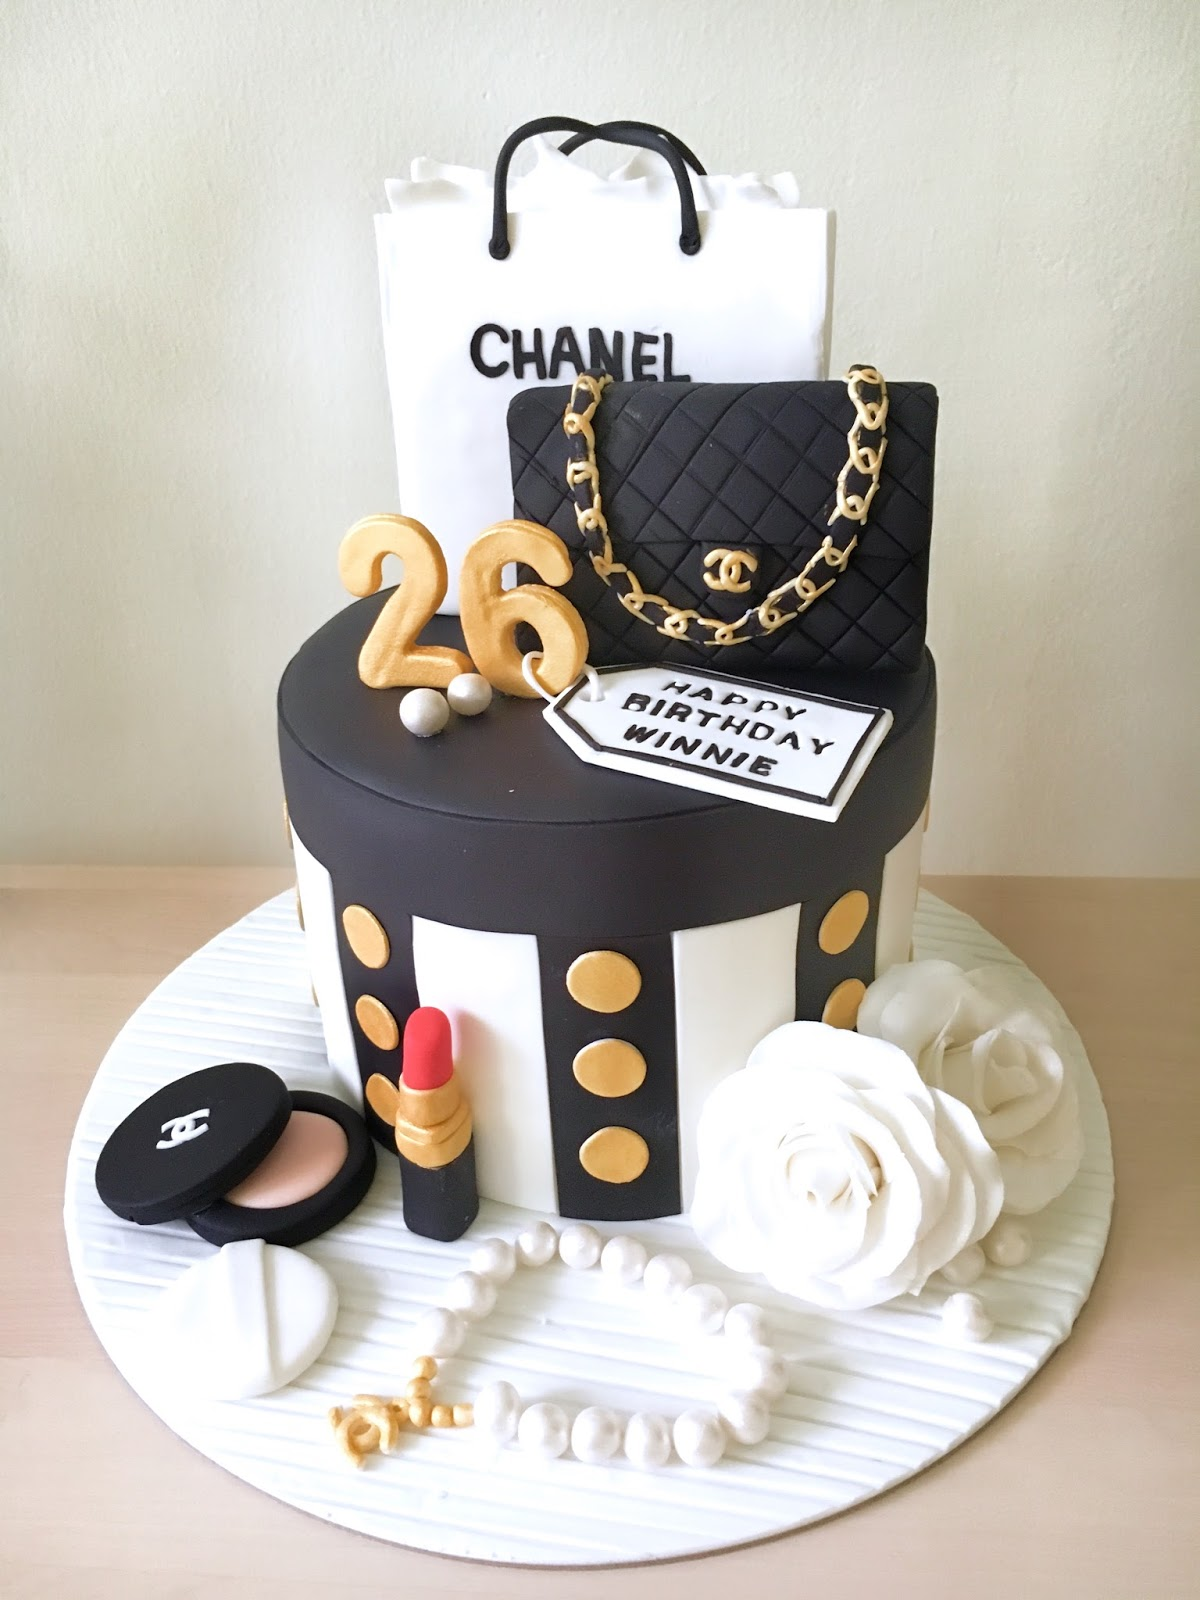 Oven Creations Happy 26th Birthday Winnie Part 2